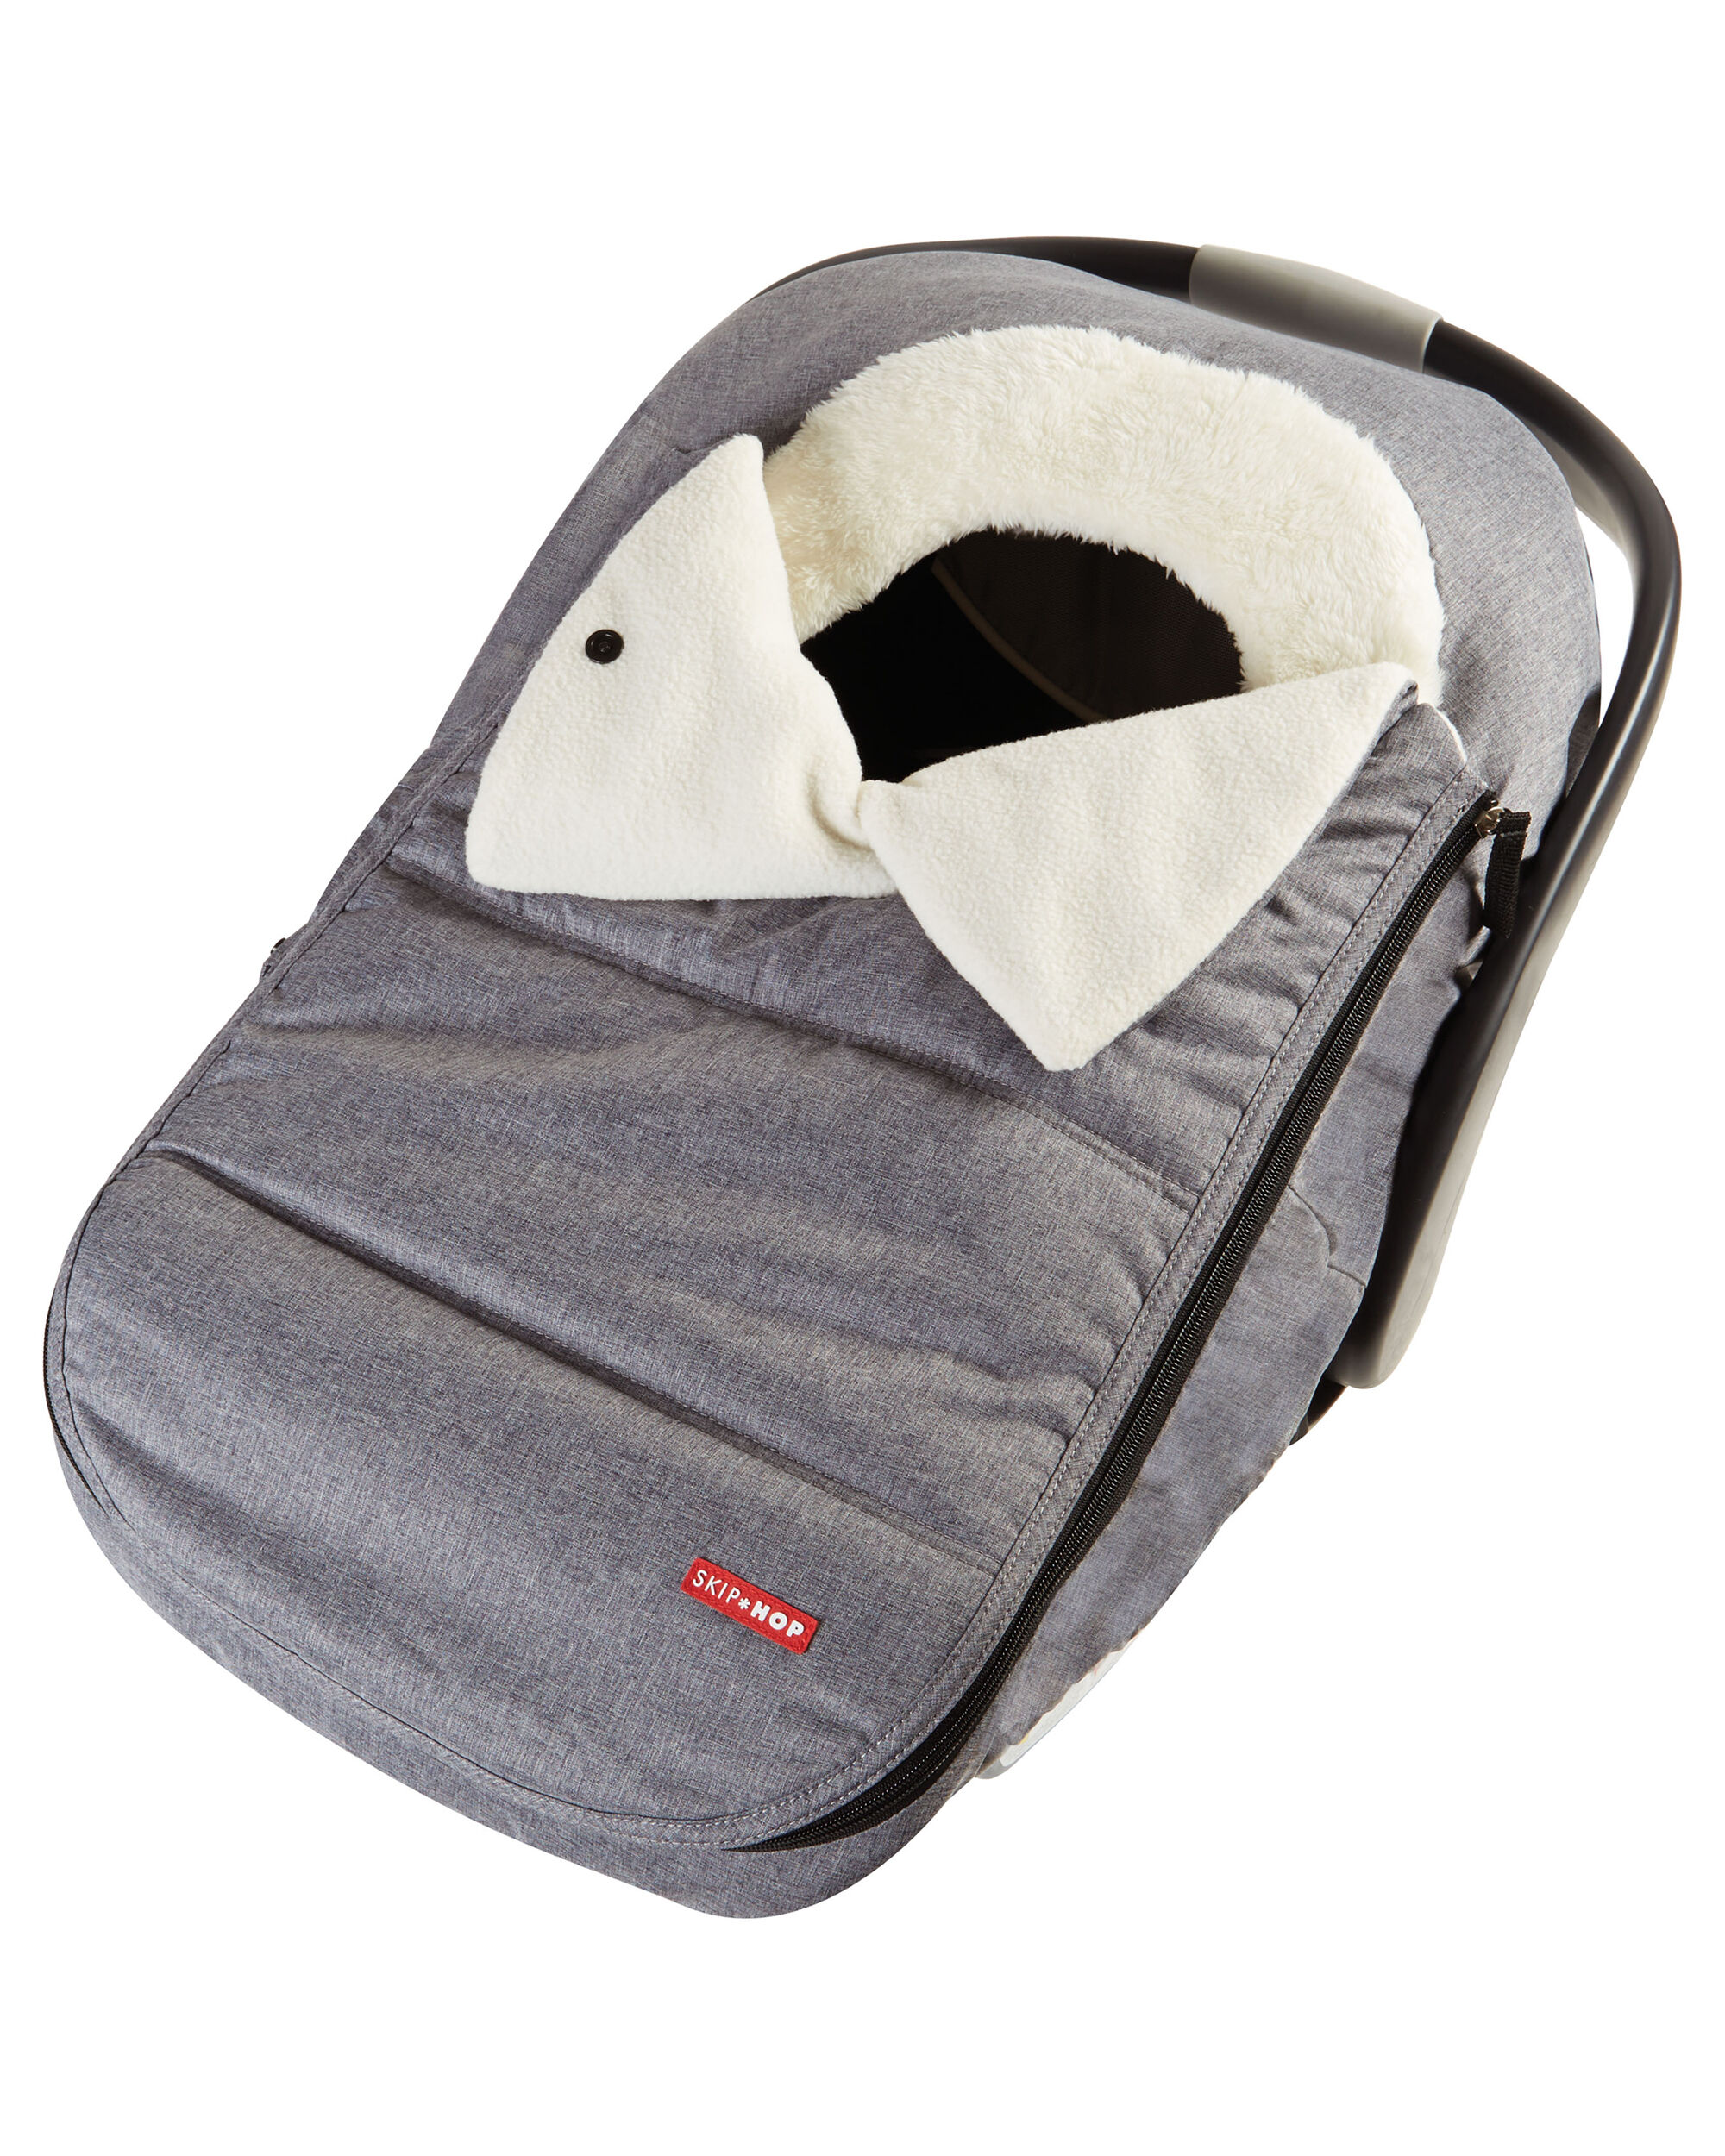 STROLL & GO Car Seat Cover